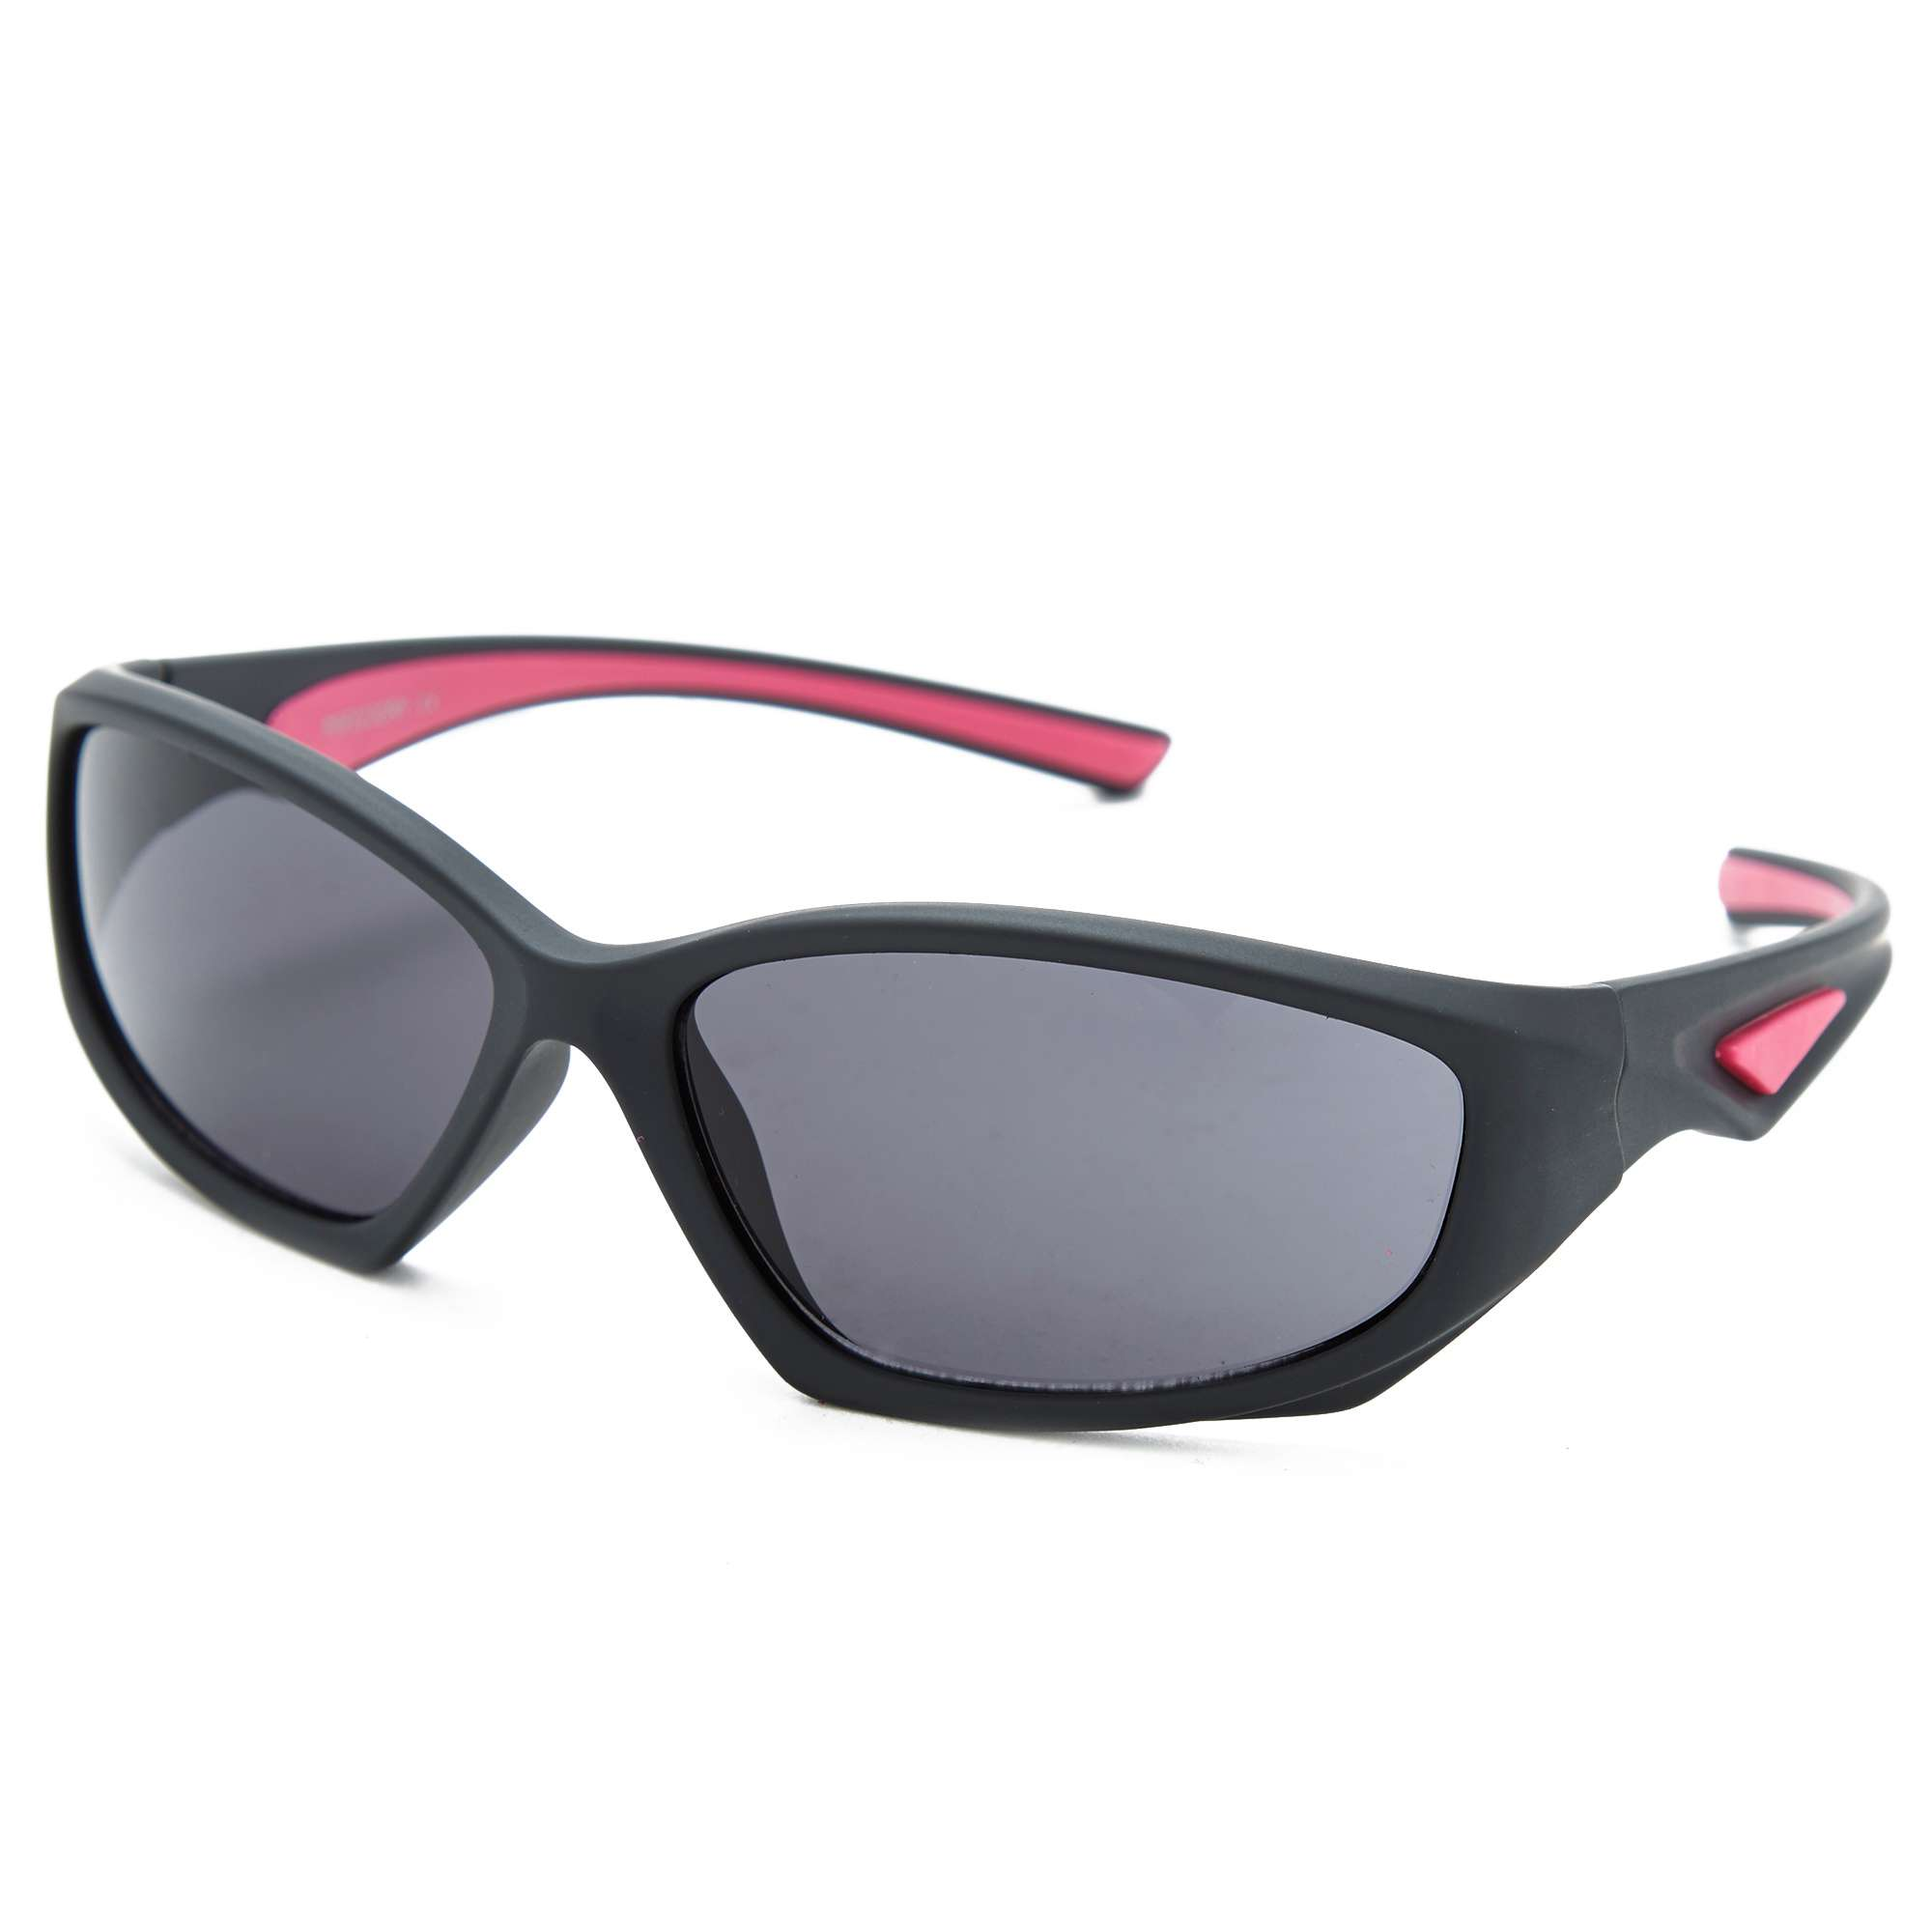 PETER STORM Girls' Sport Mirrored Sunglasses